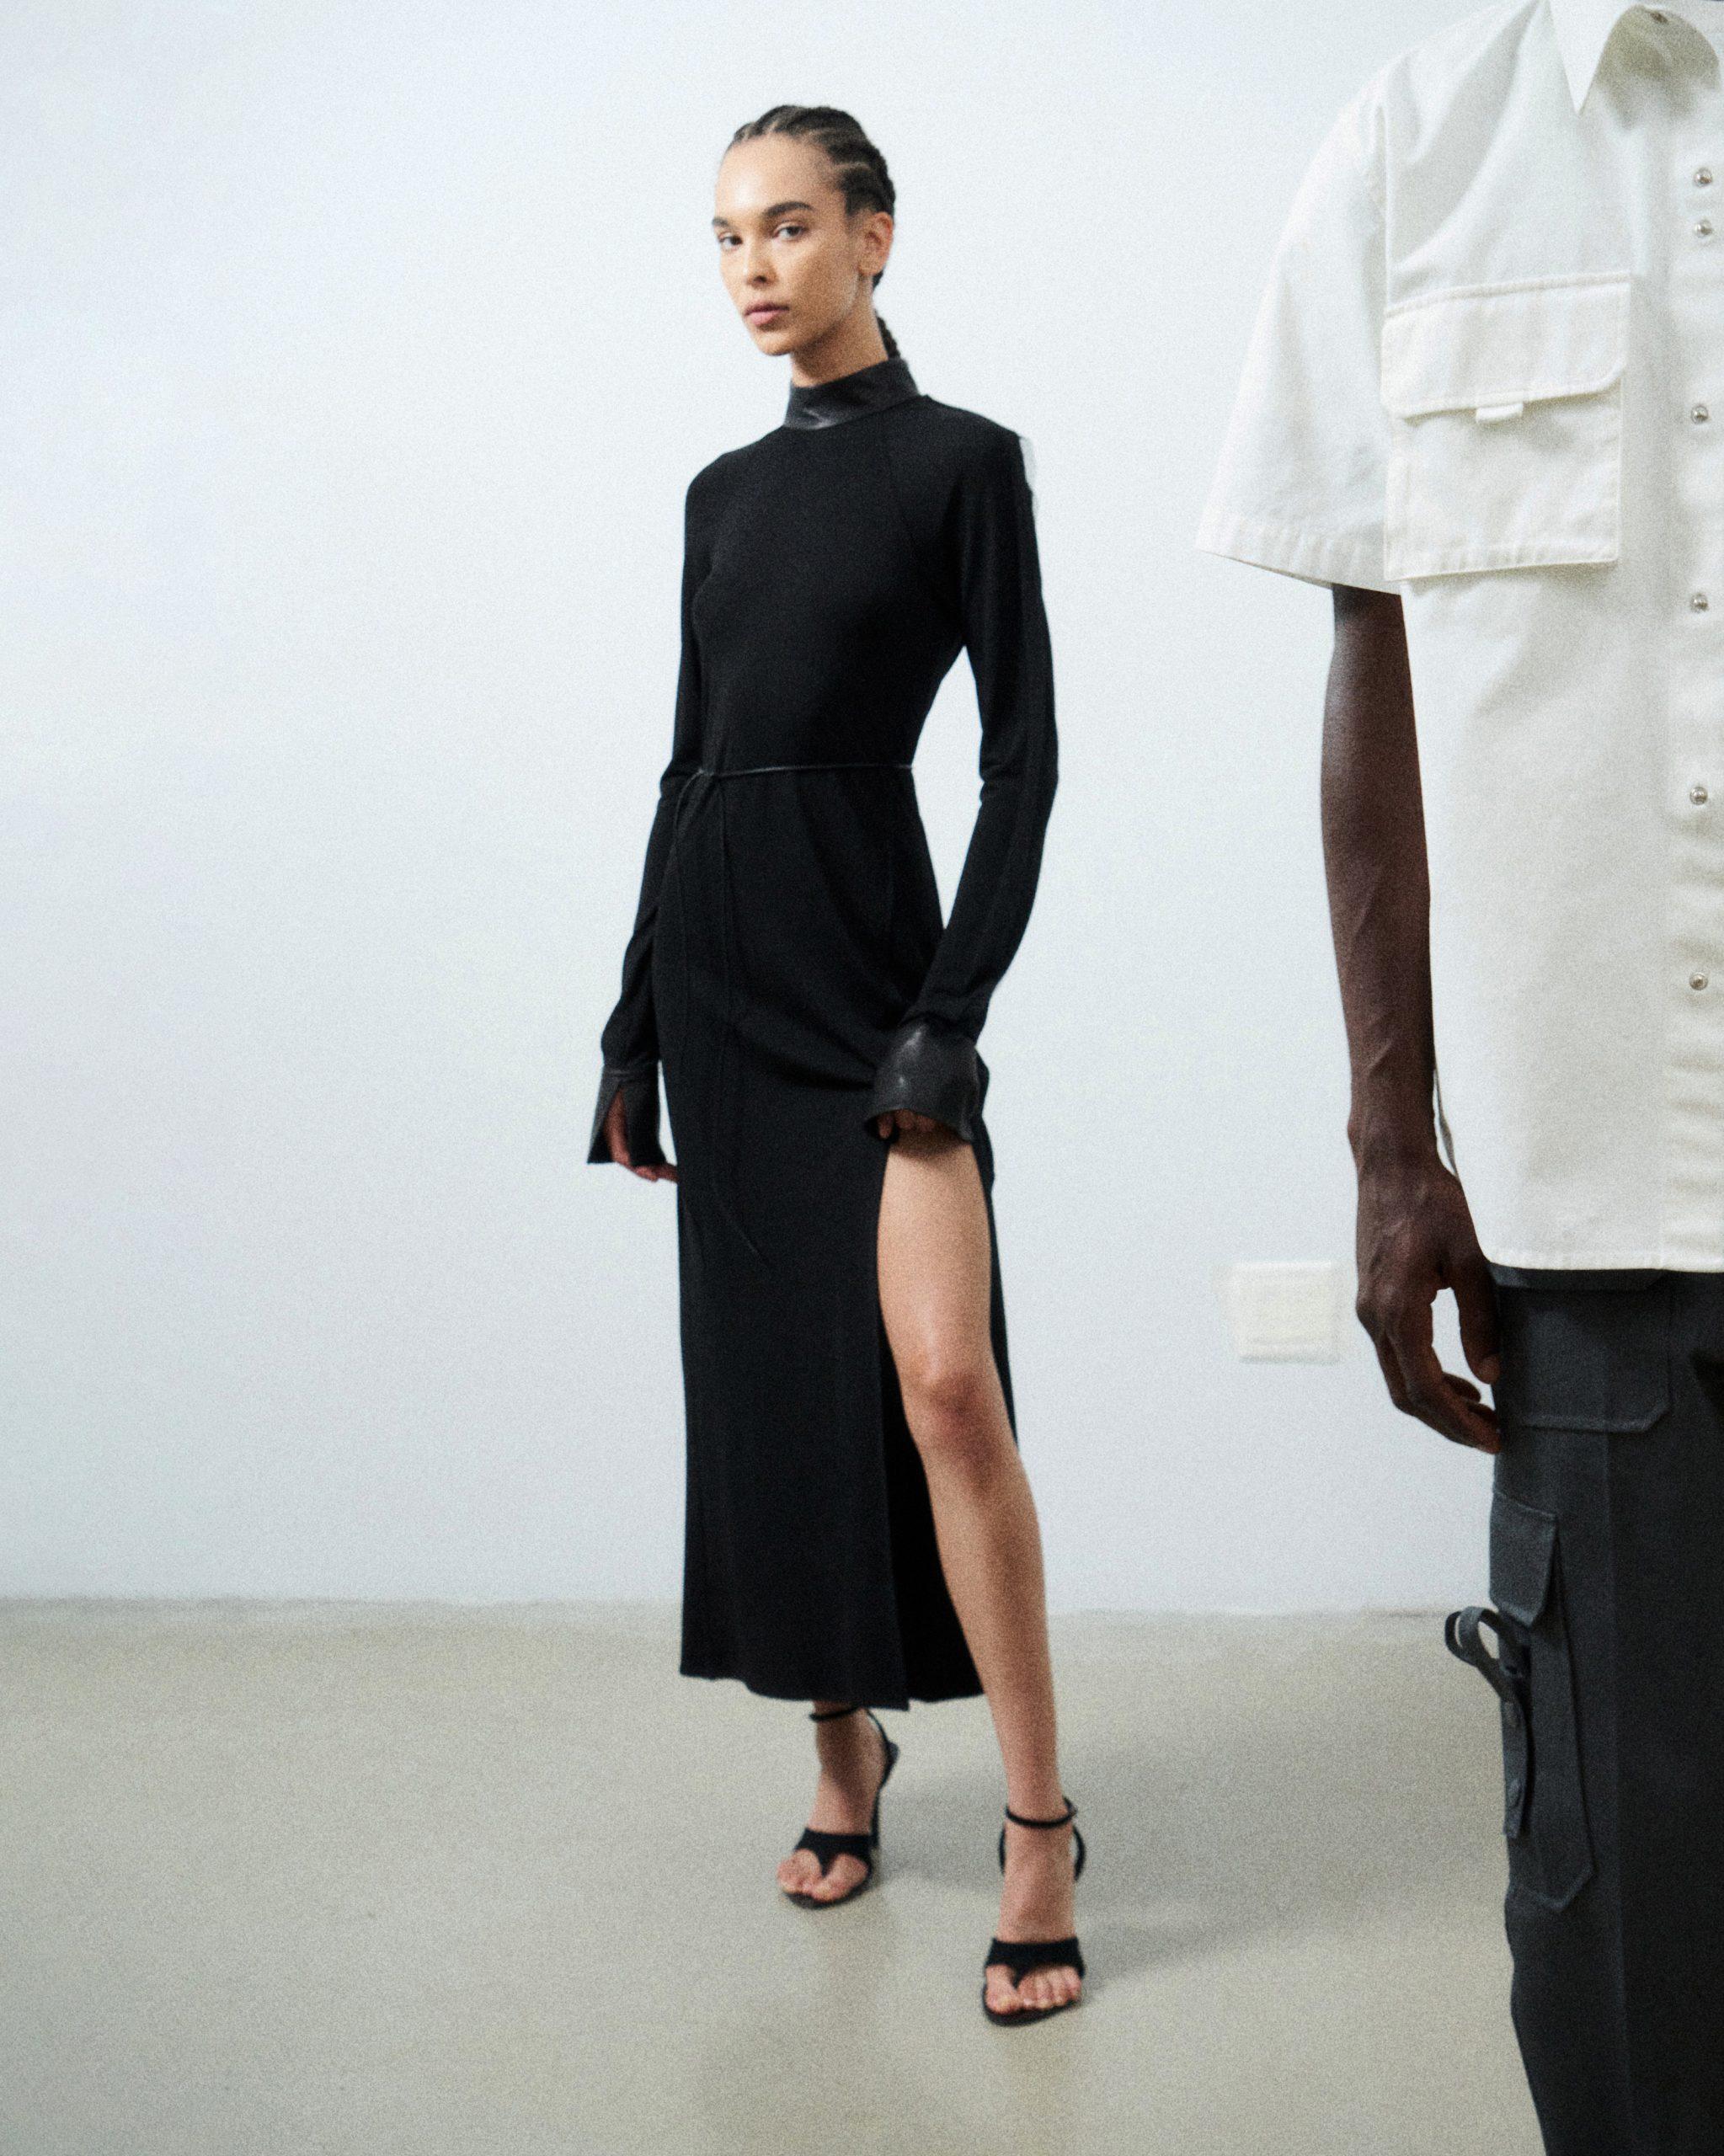 Helmut Lang Resort 2022 Fashion Show Photos